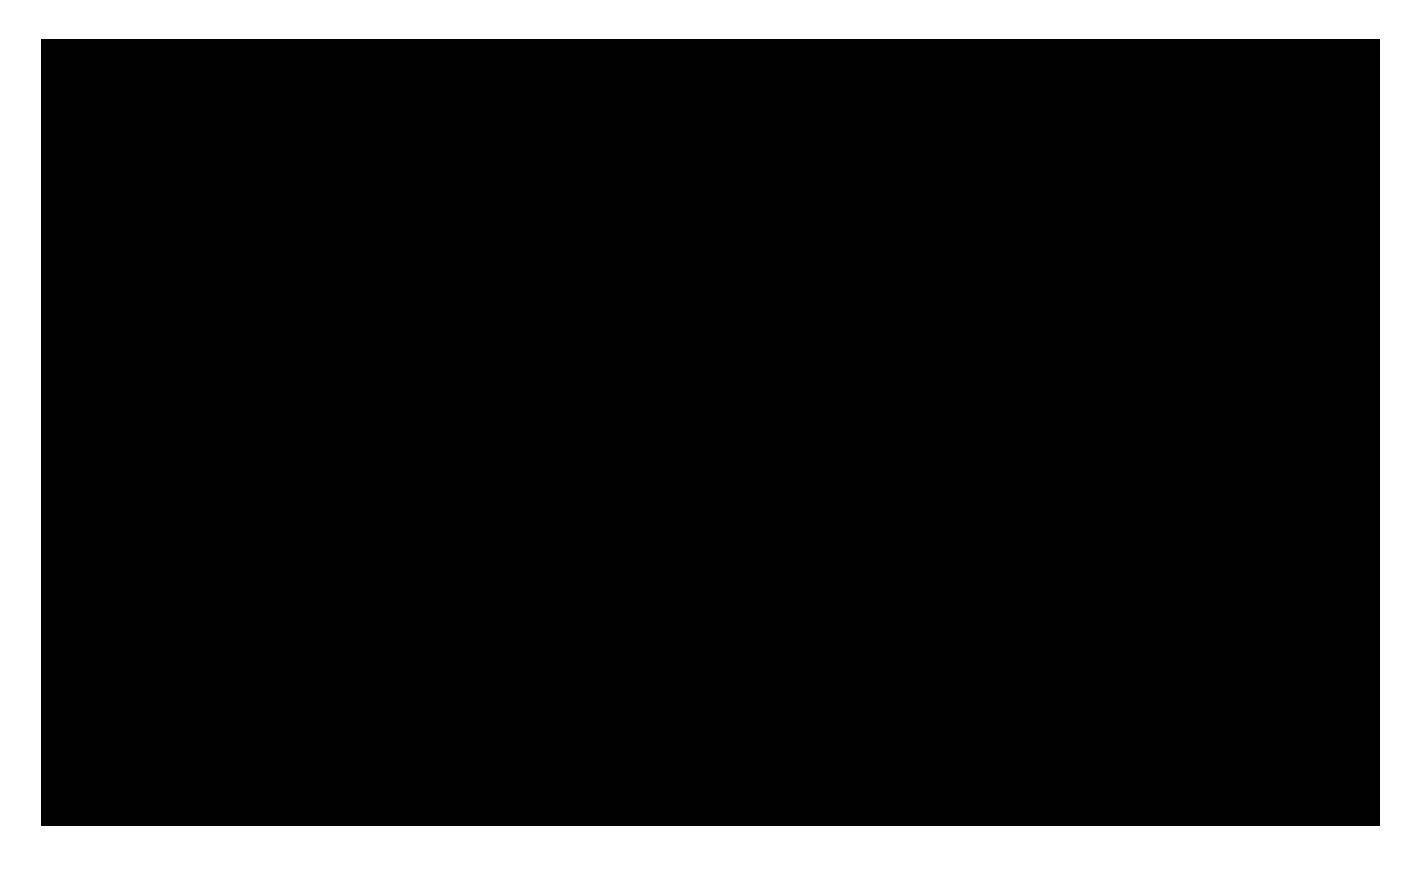 Logo Blond Amstelveen